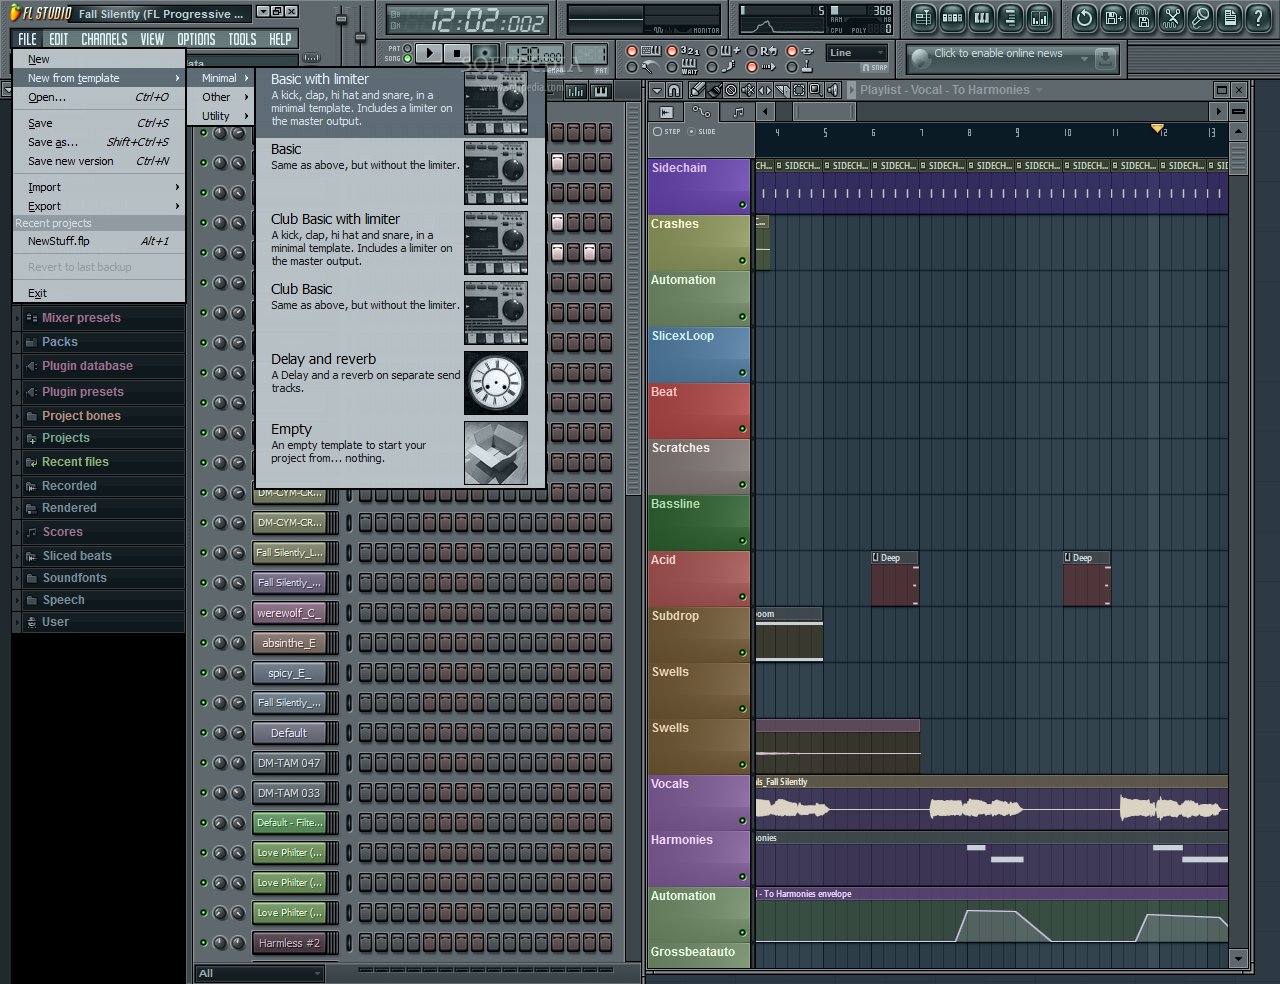 fl studio 10 full version download utorrent